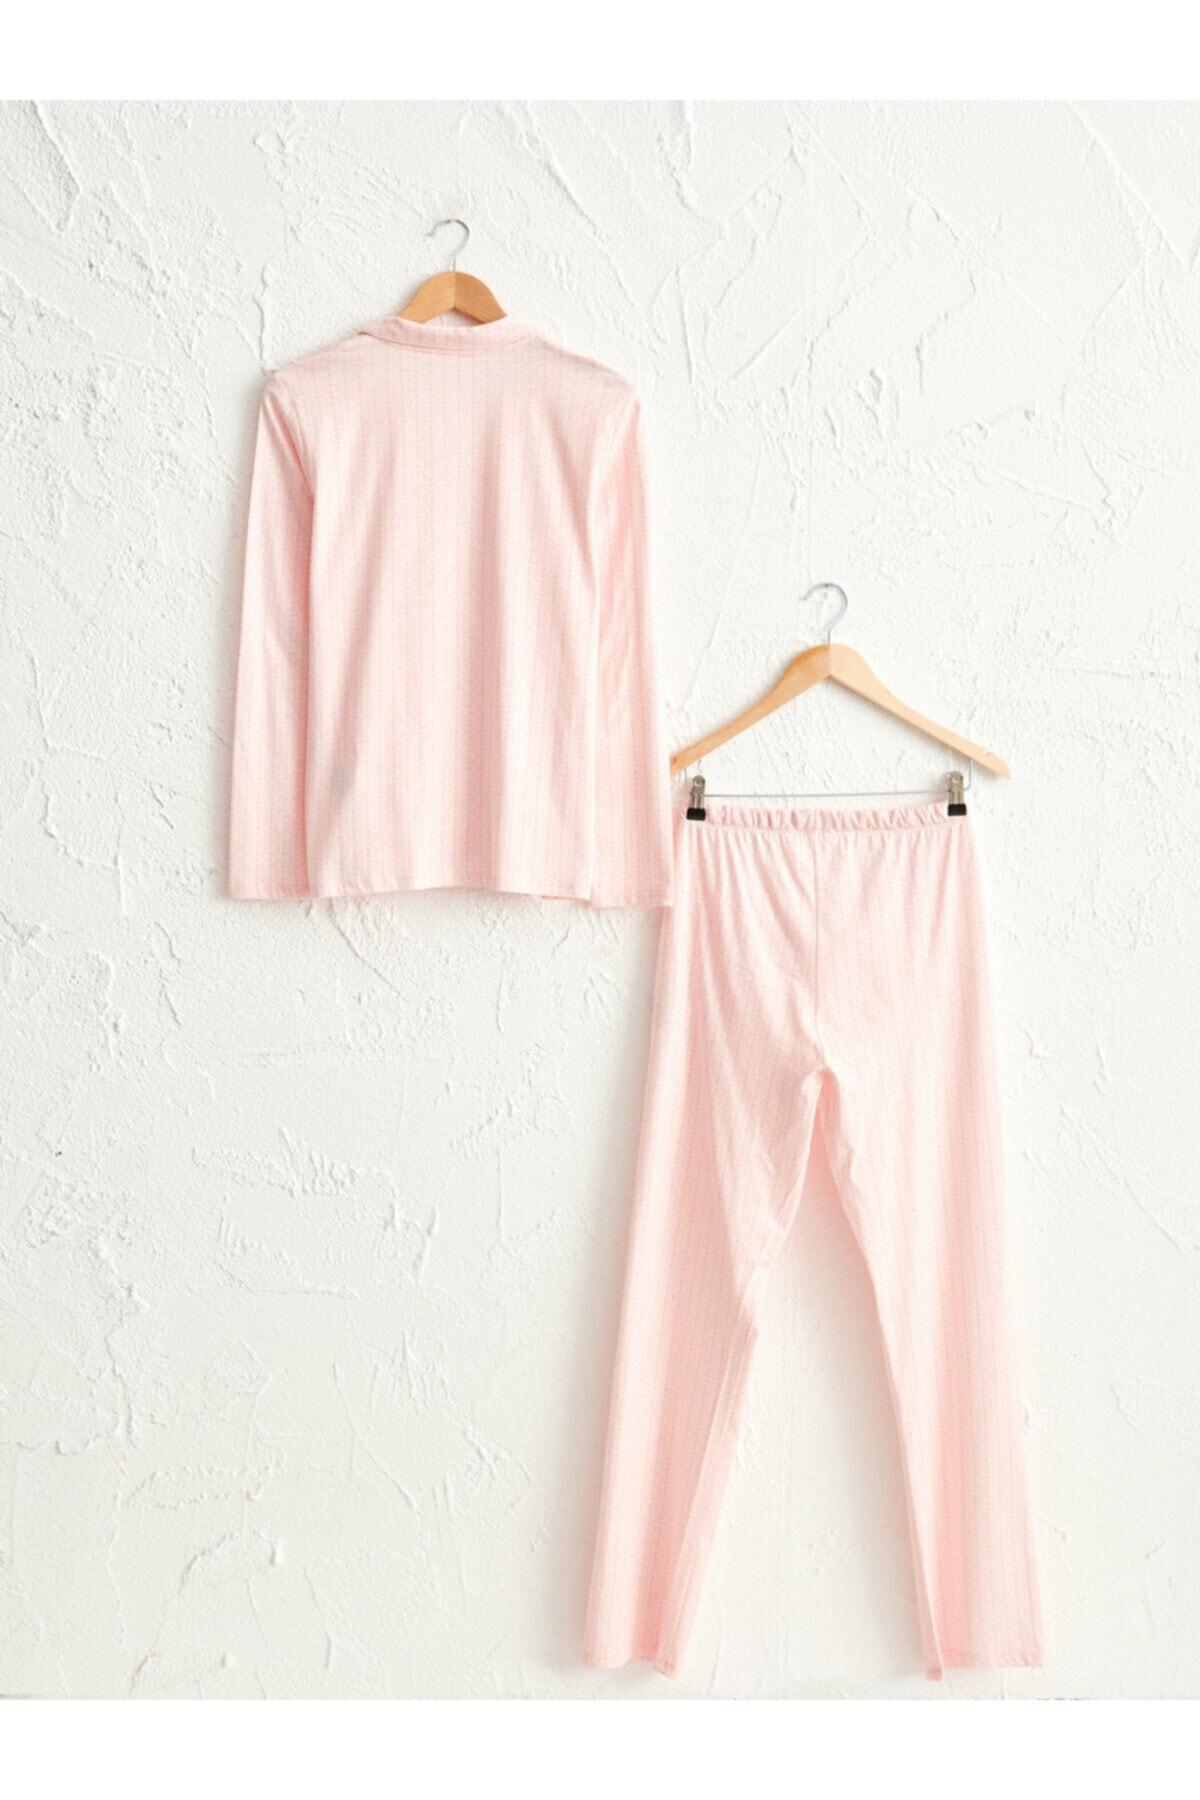 LC Waikiki Kadın Pembe Pijama Takımı 2